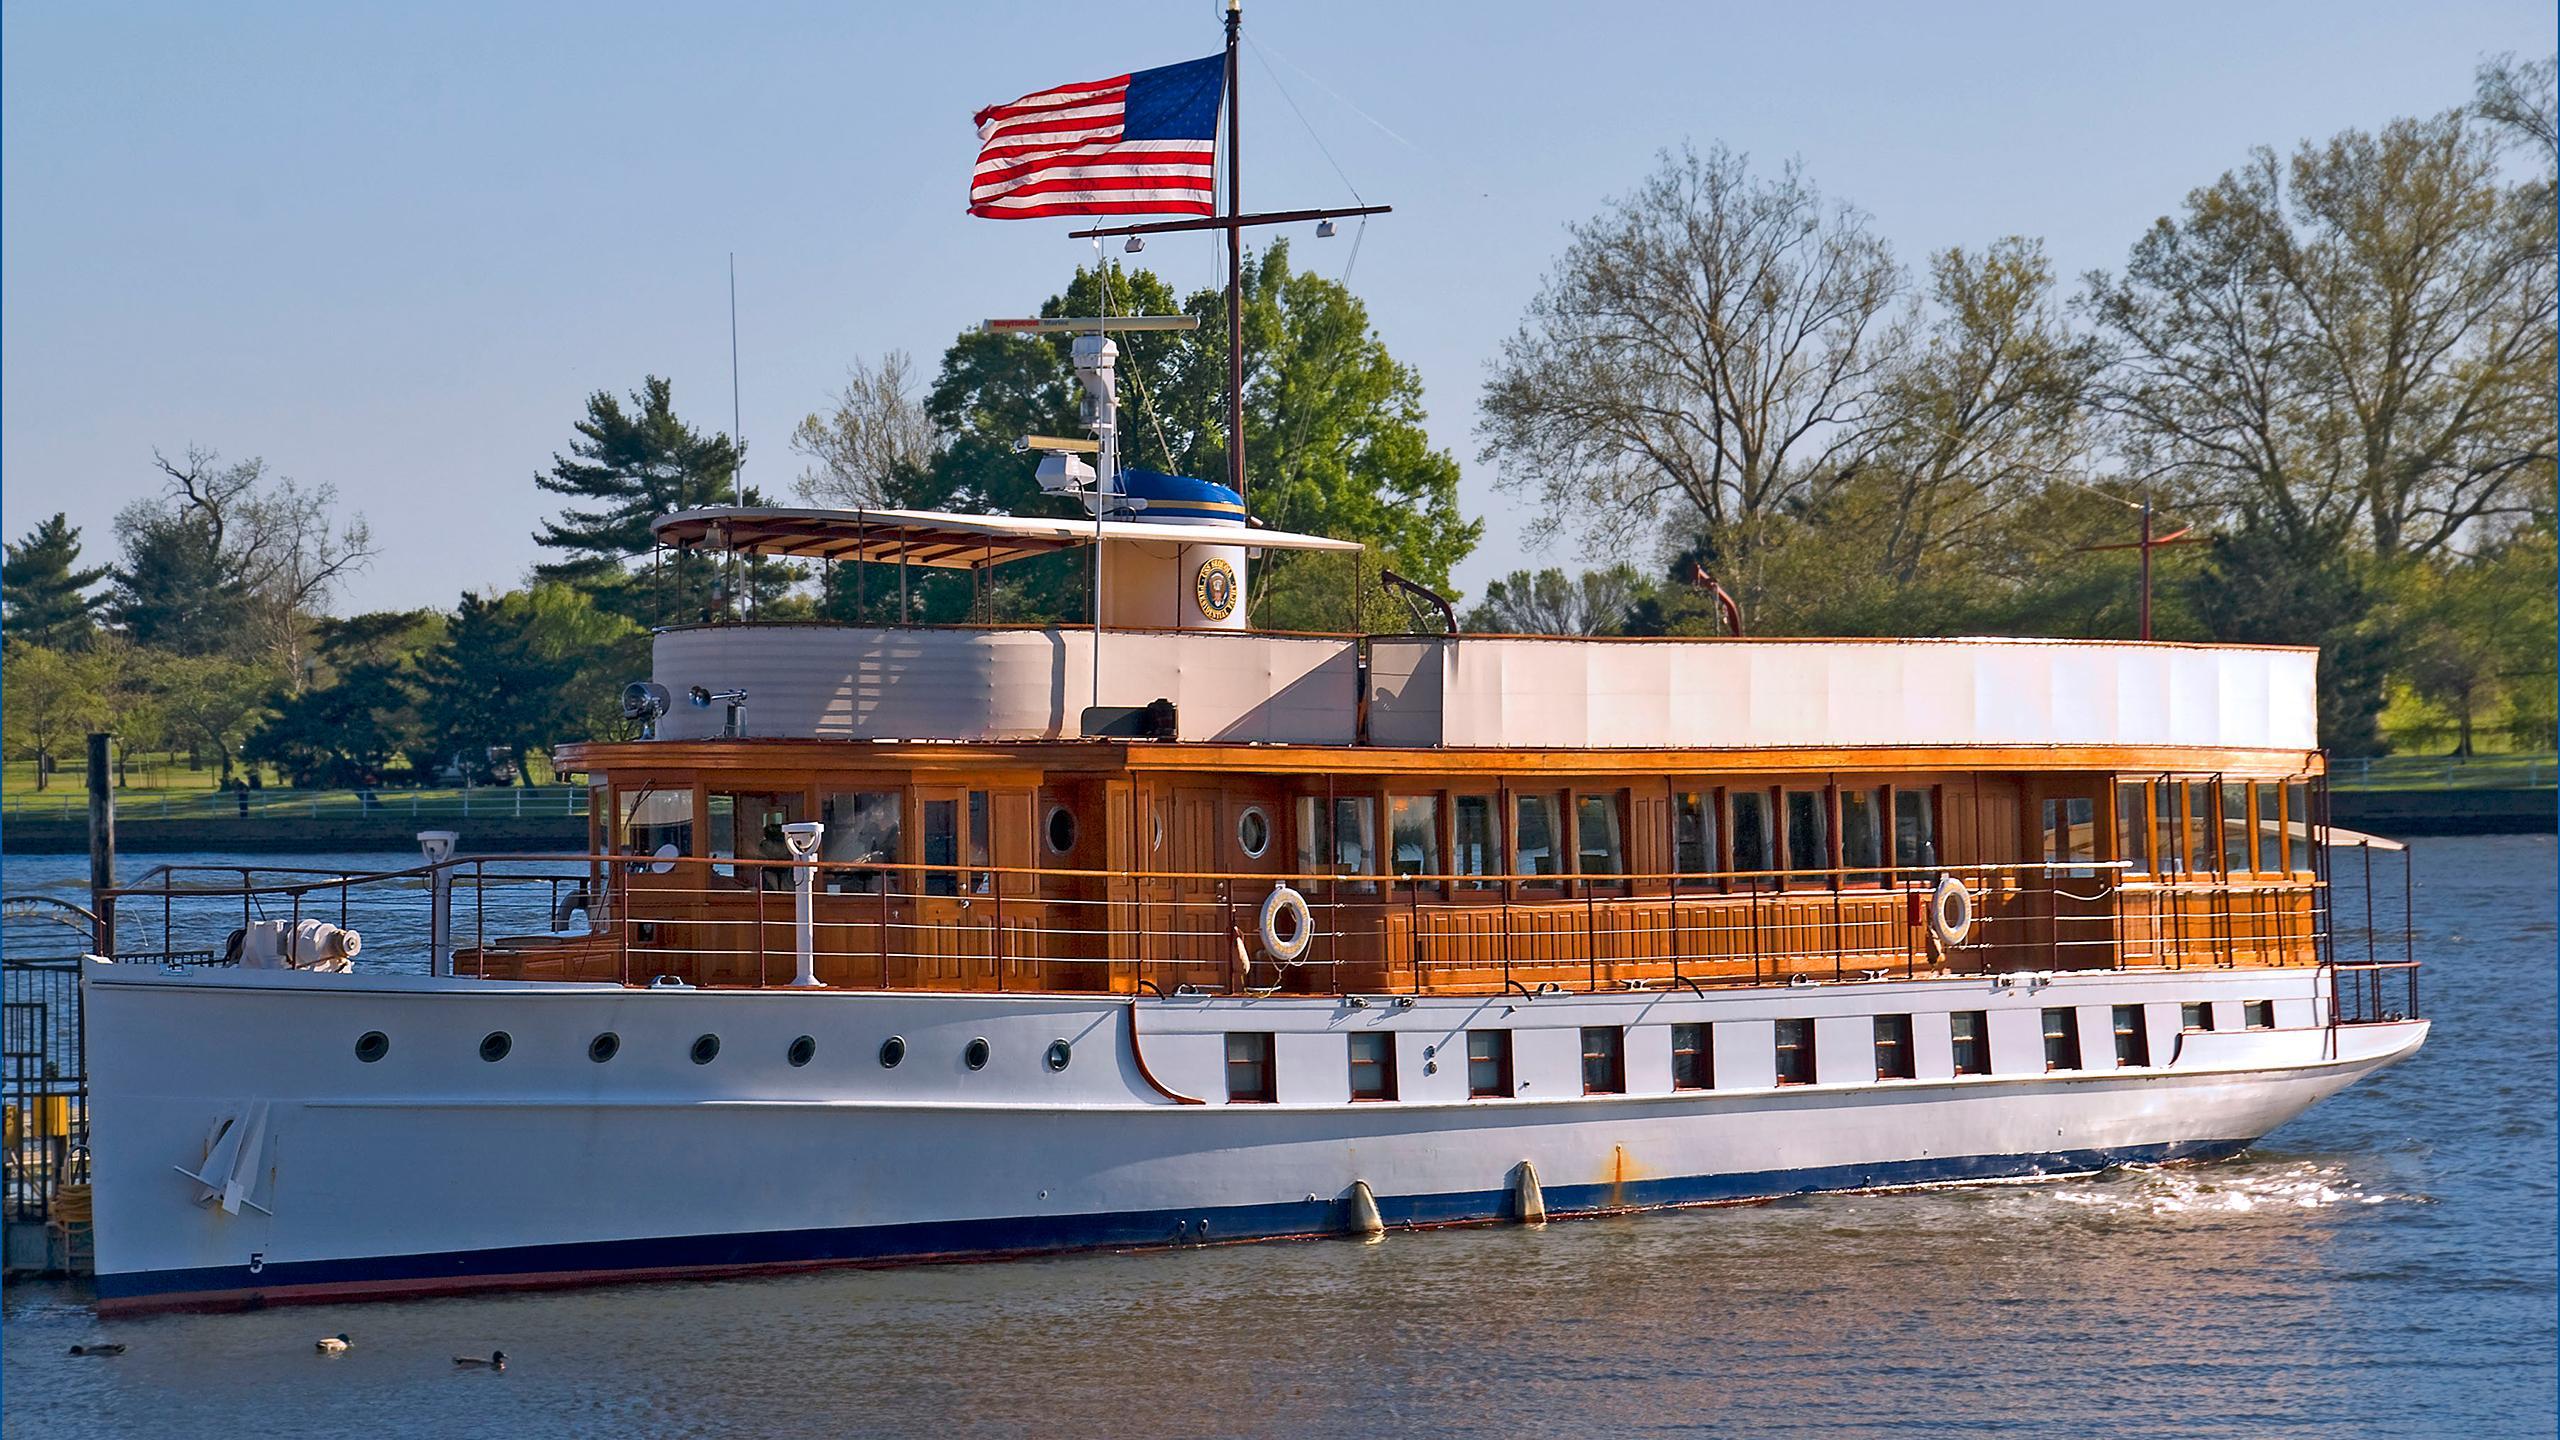 megayacht presidential yacht sequoia 2560x1440